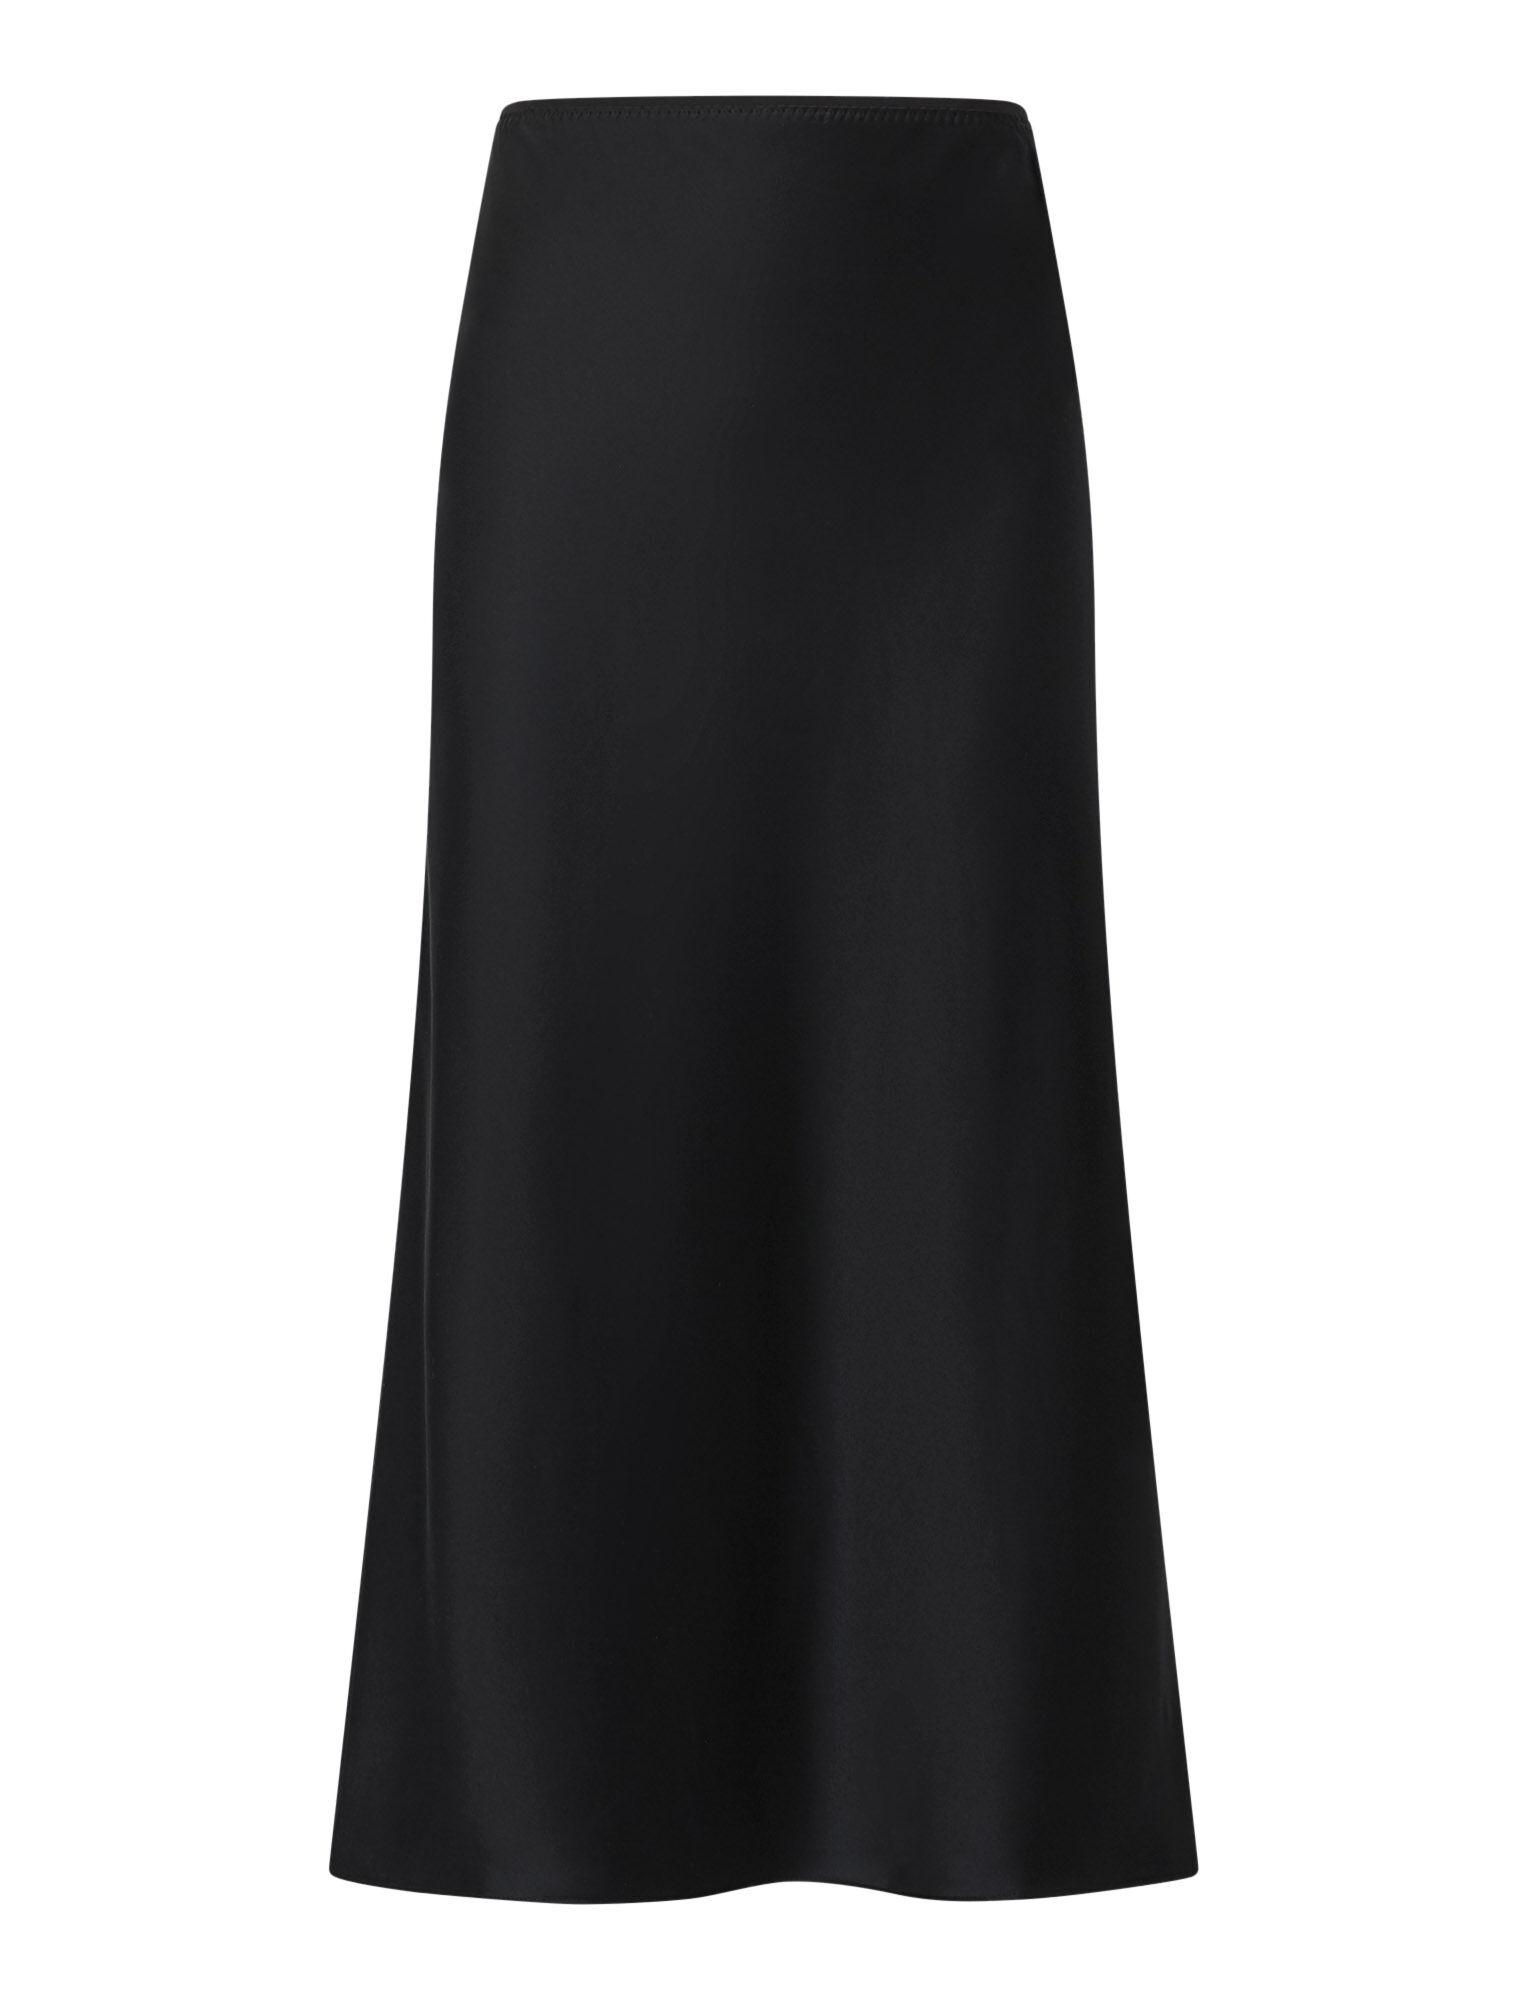 Joseph, Isaak Silk Satin Skirt, in BLACK